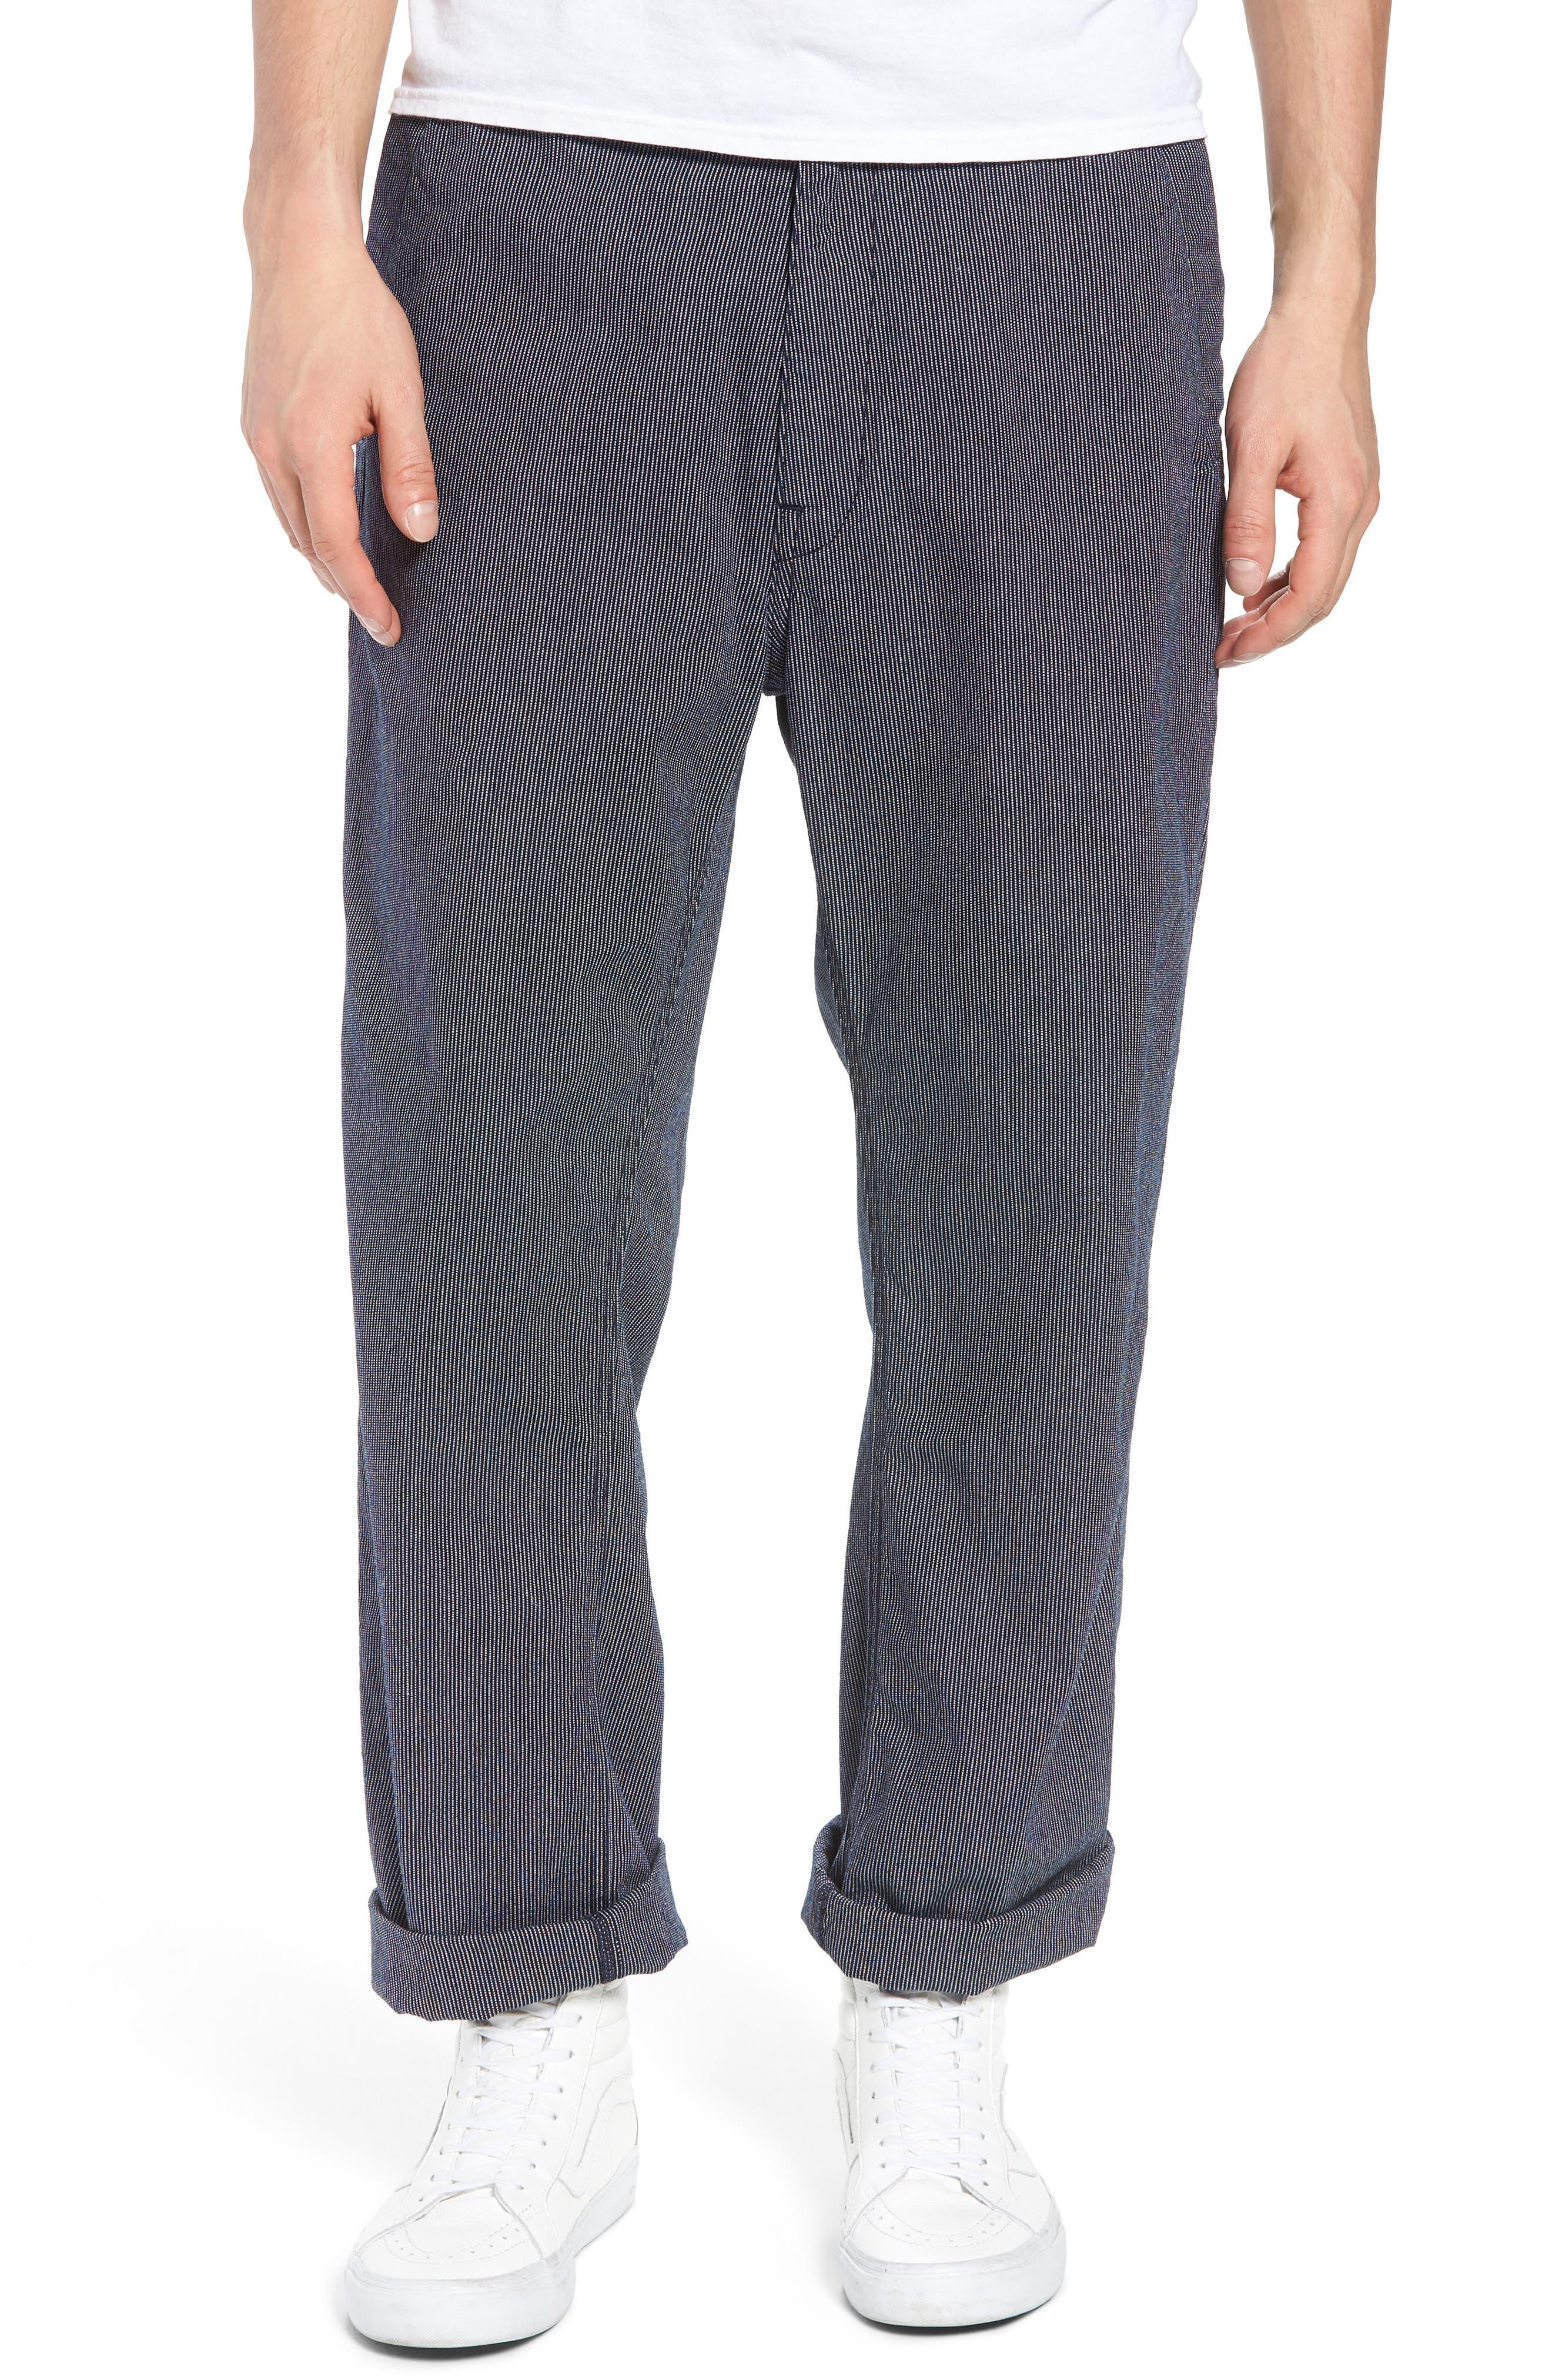 G-Star Raw Bronson Loose Fit Chino Pants